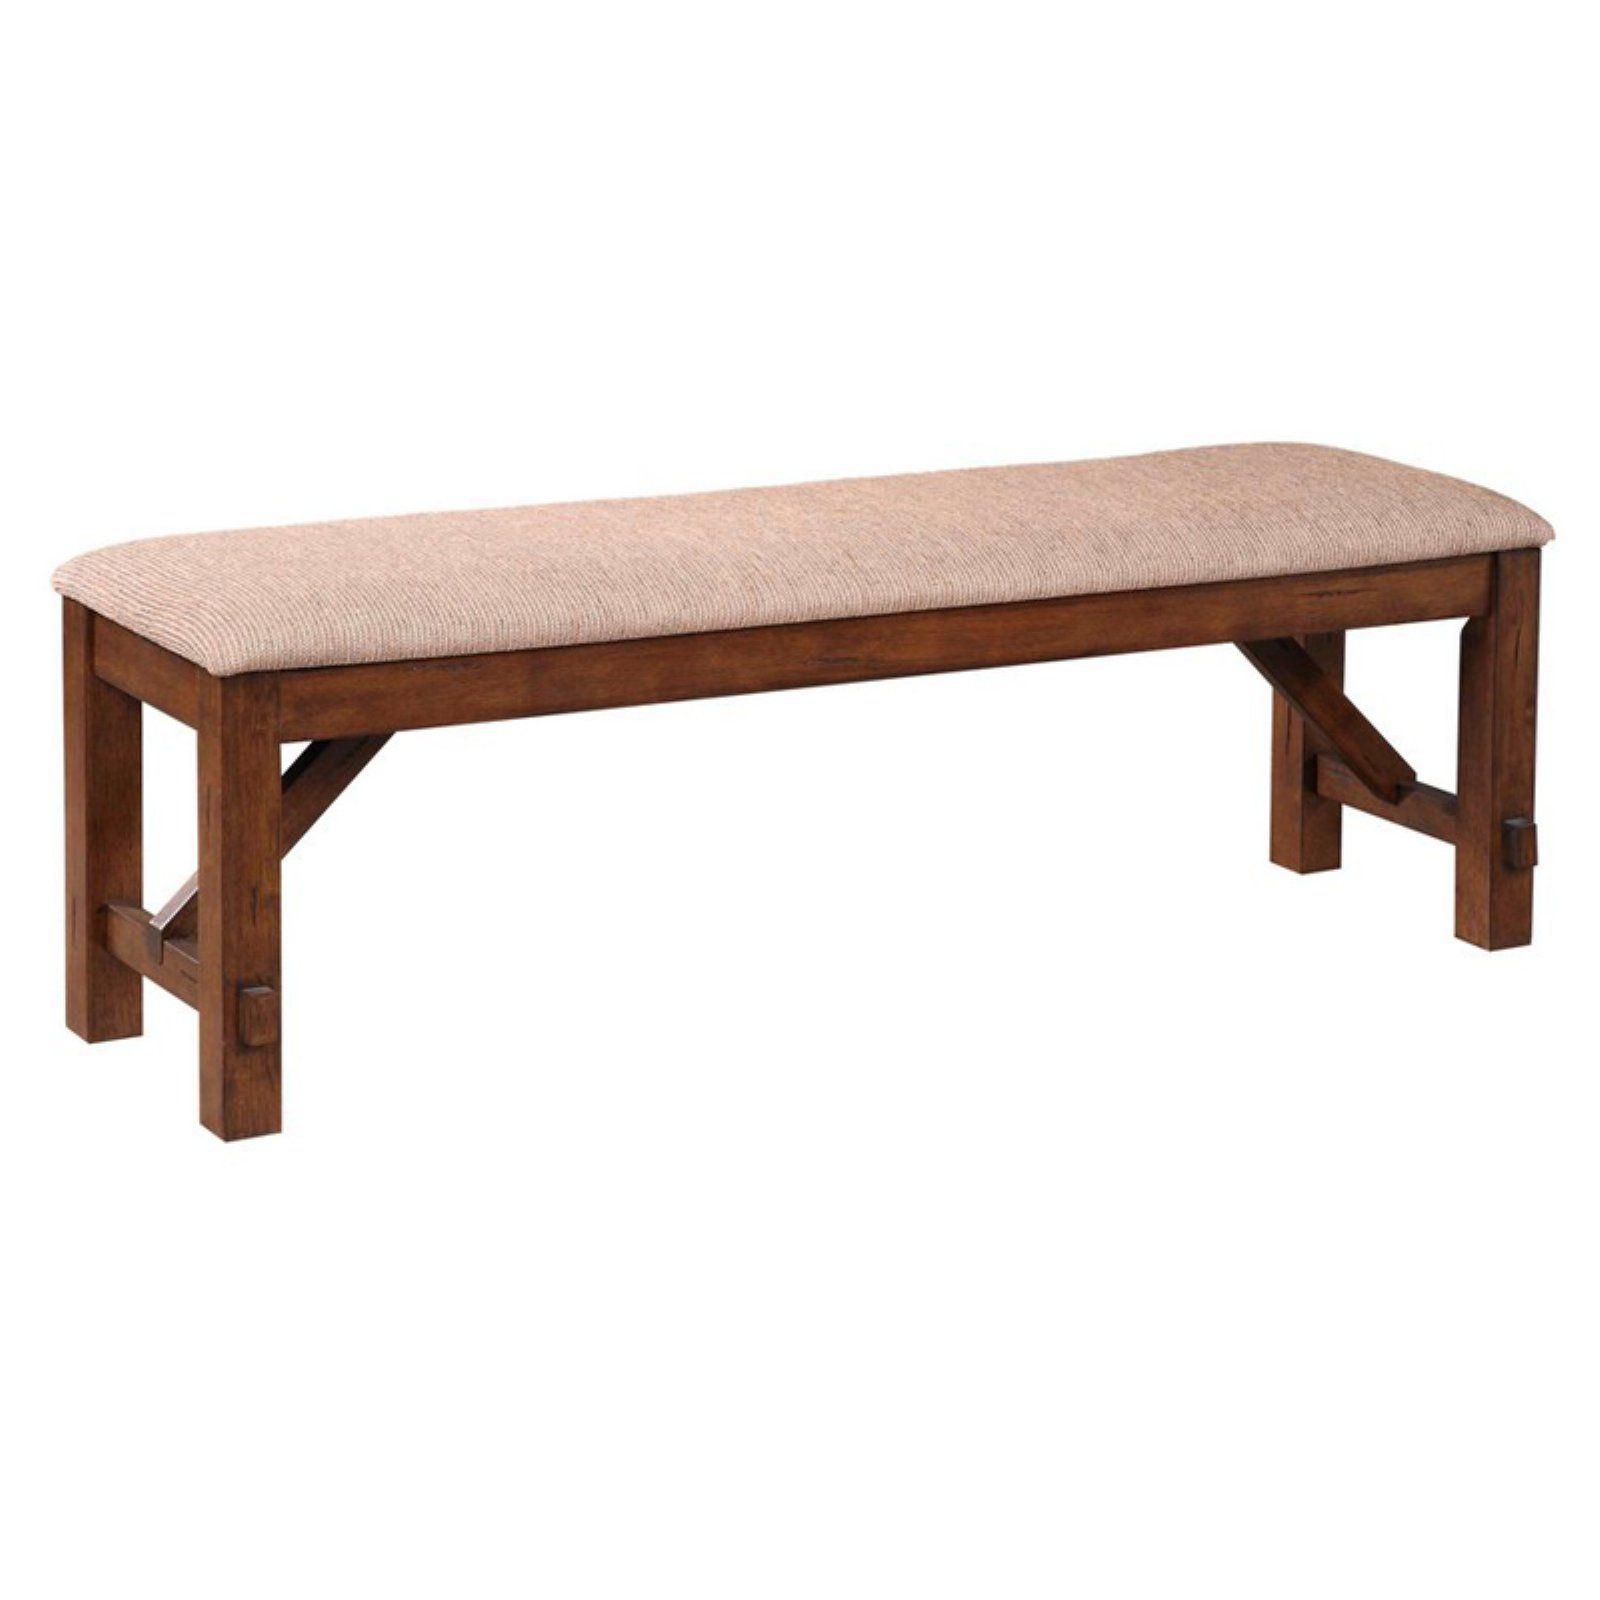 Roundhill Furniture Karven Upholstered Dining Bench